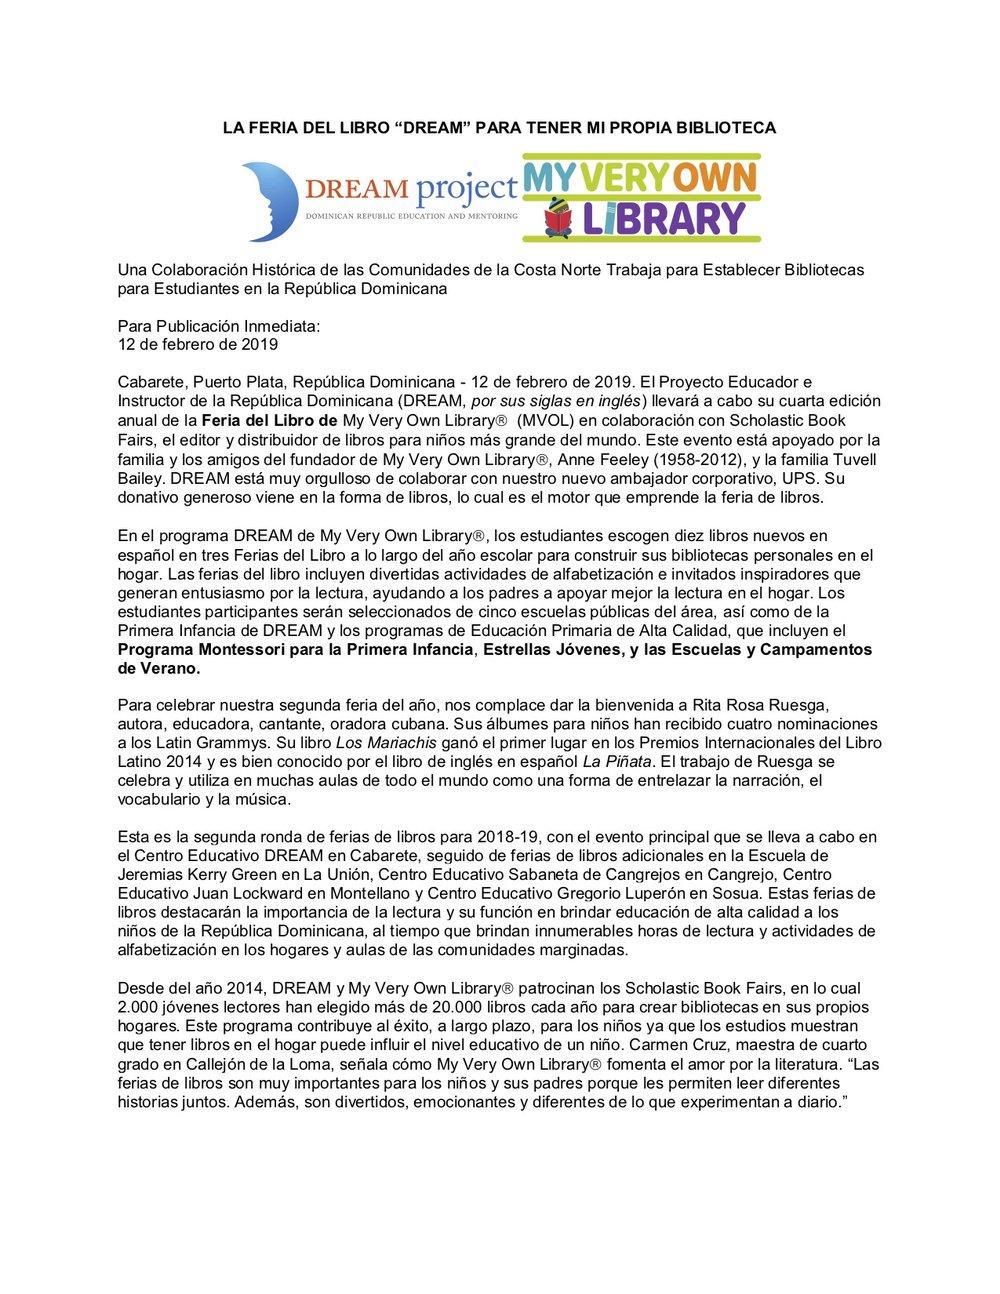 MVOL SPANISH Press Release 2019 pdf.jpg